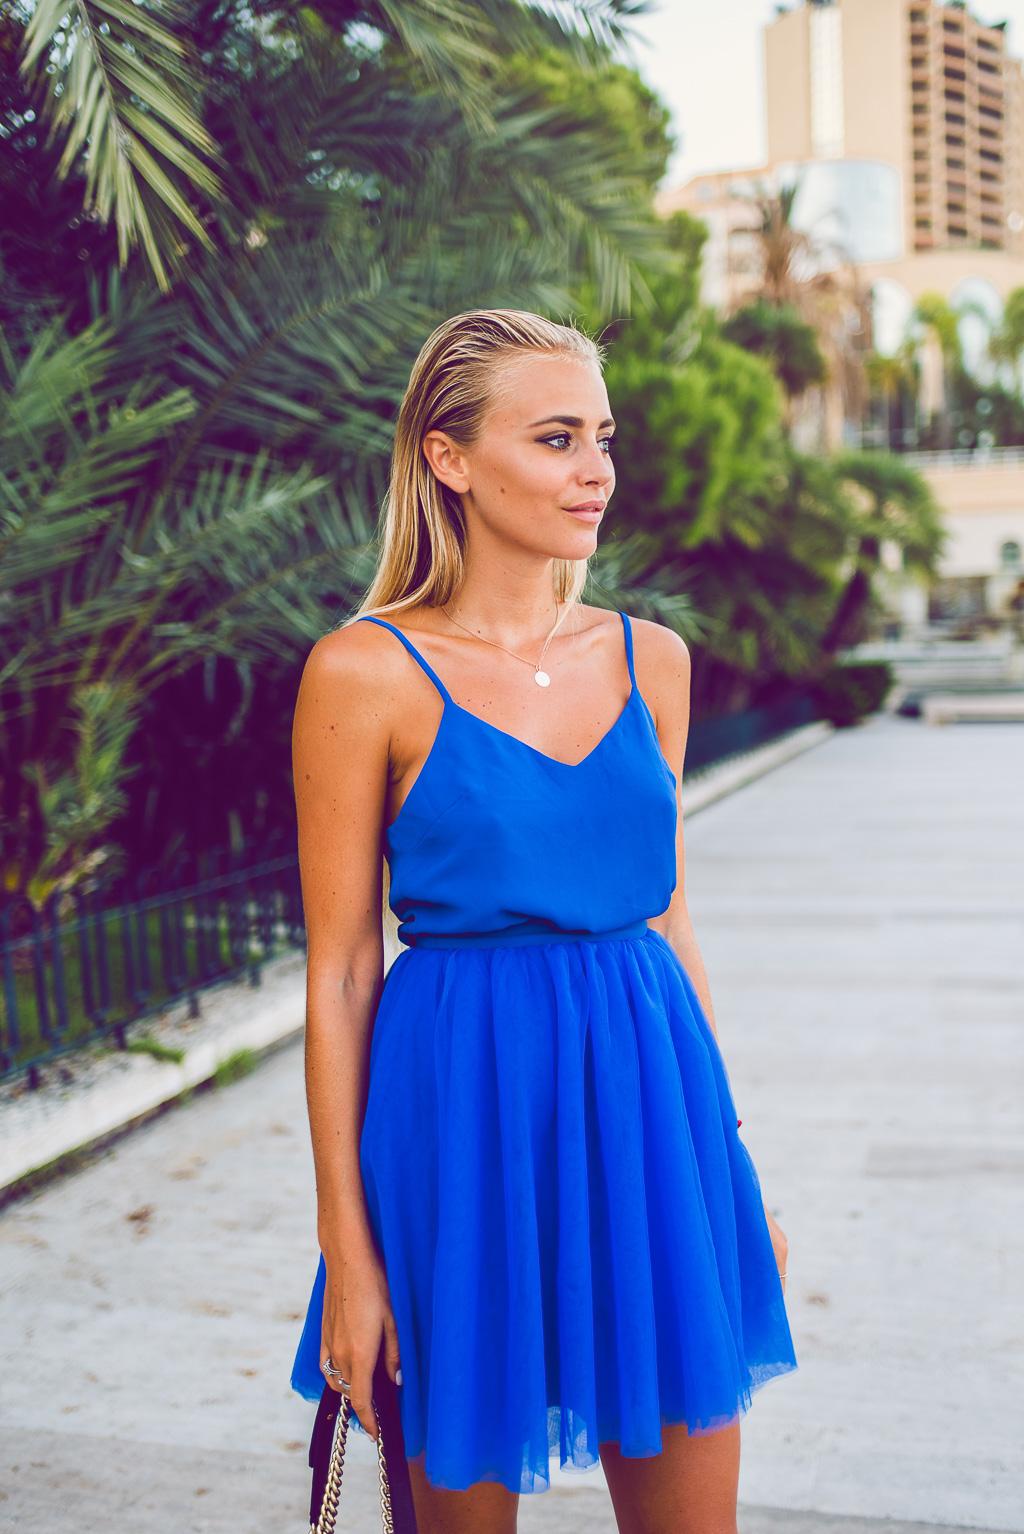 janni-deler-blue-ballerinaDSC_0492-Redigera